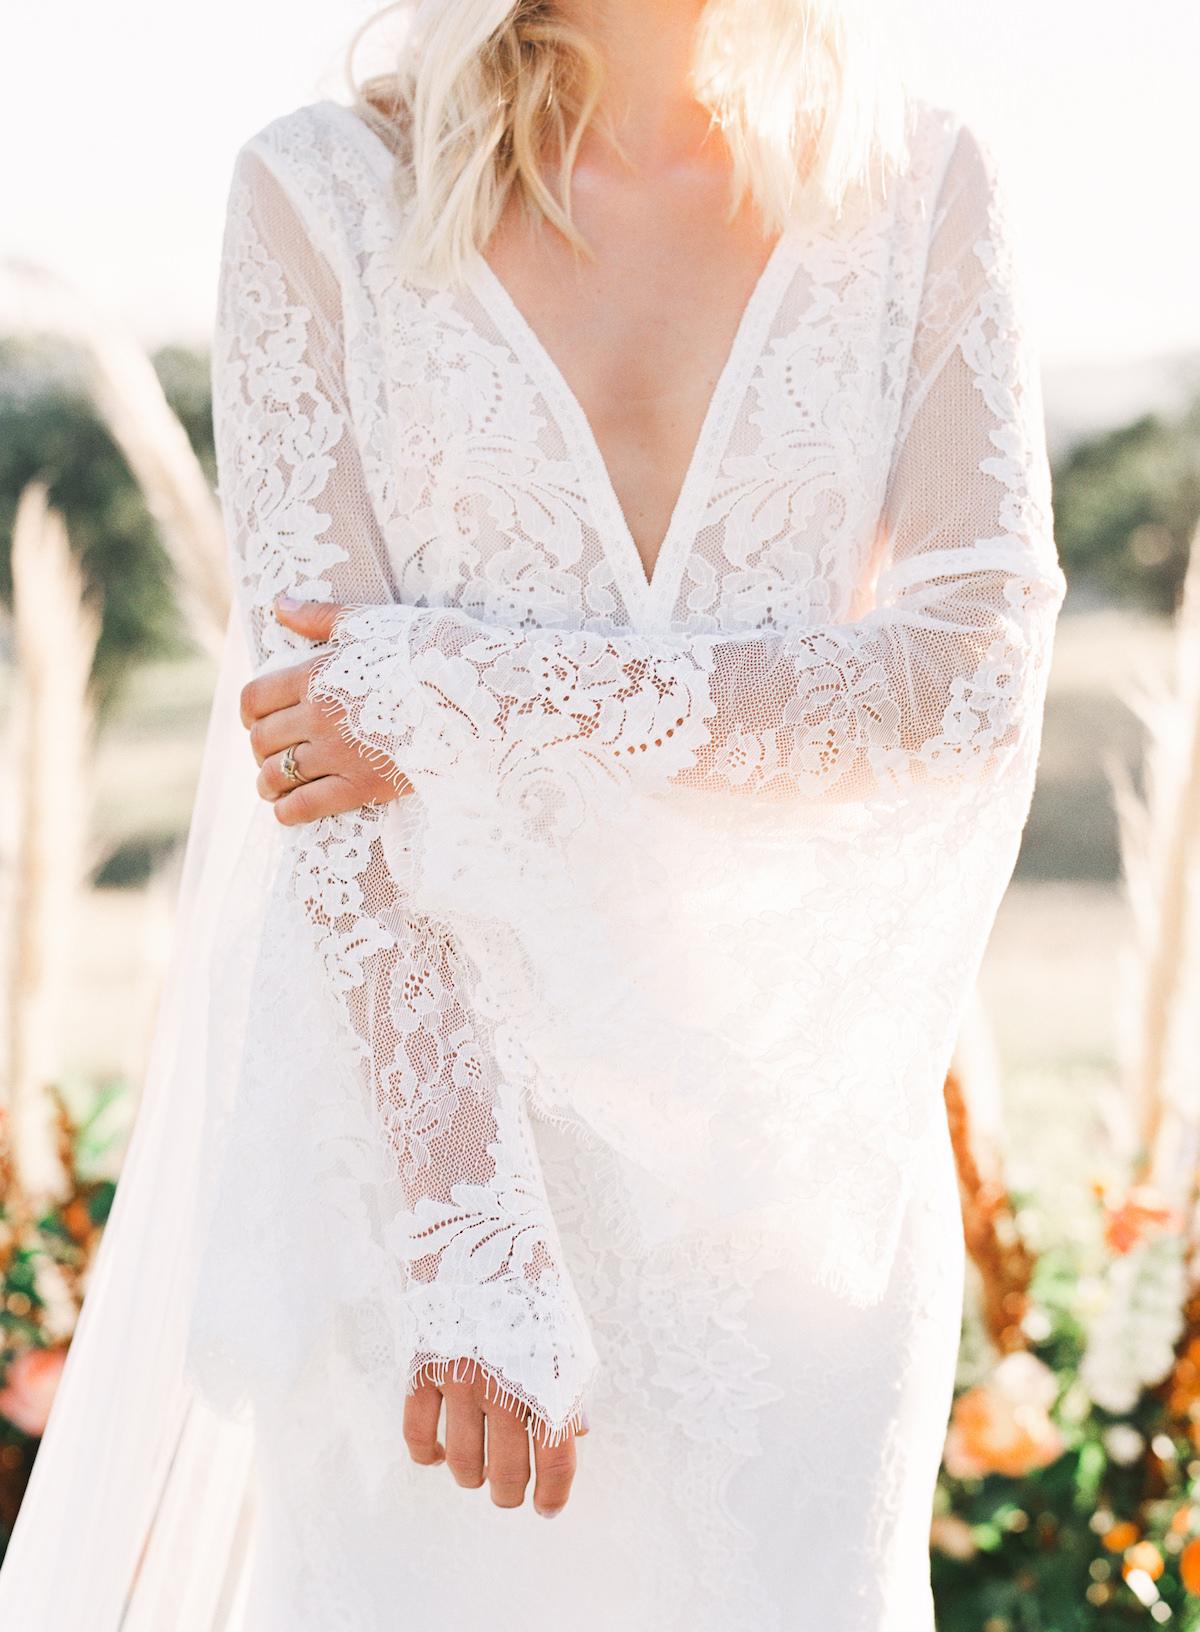 Riata-Ranch-Santa-Margarita-Wedding-Photography-San-Luis-Obispo-Ashley-Rae-Studio146.jpg